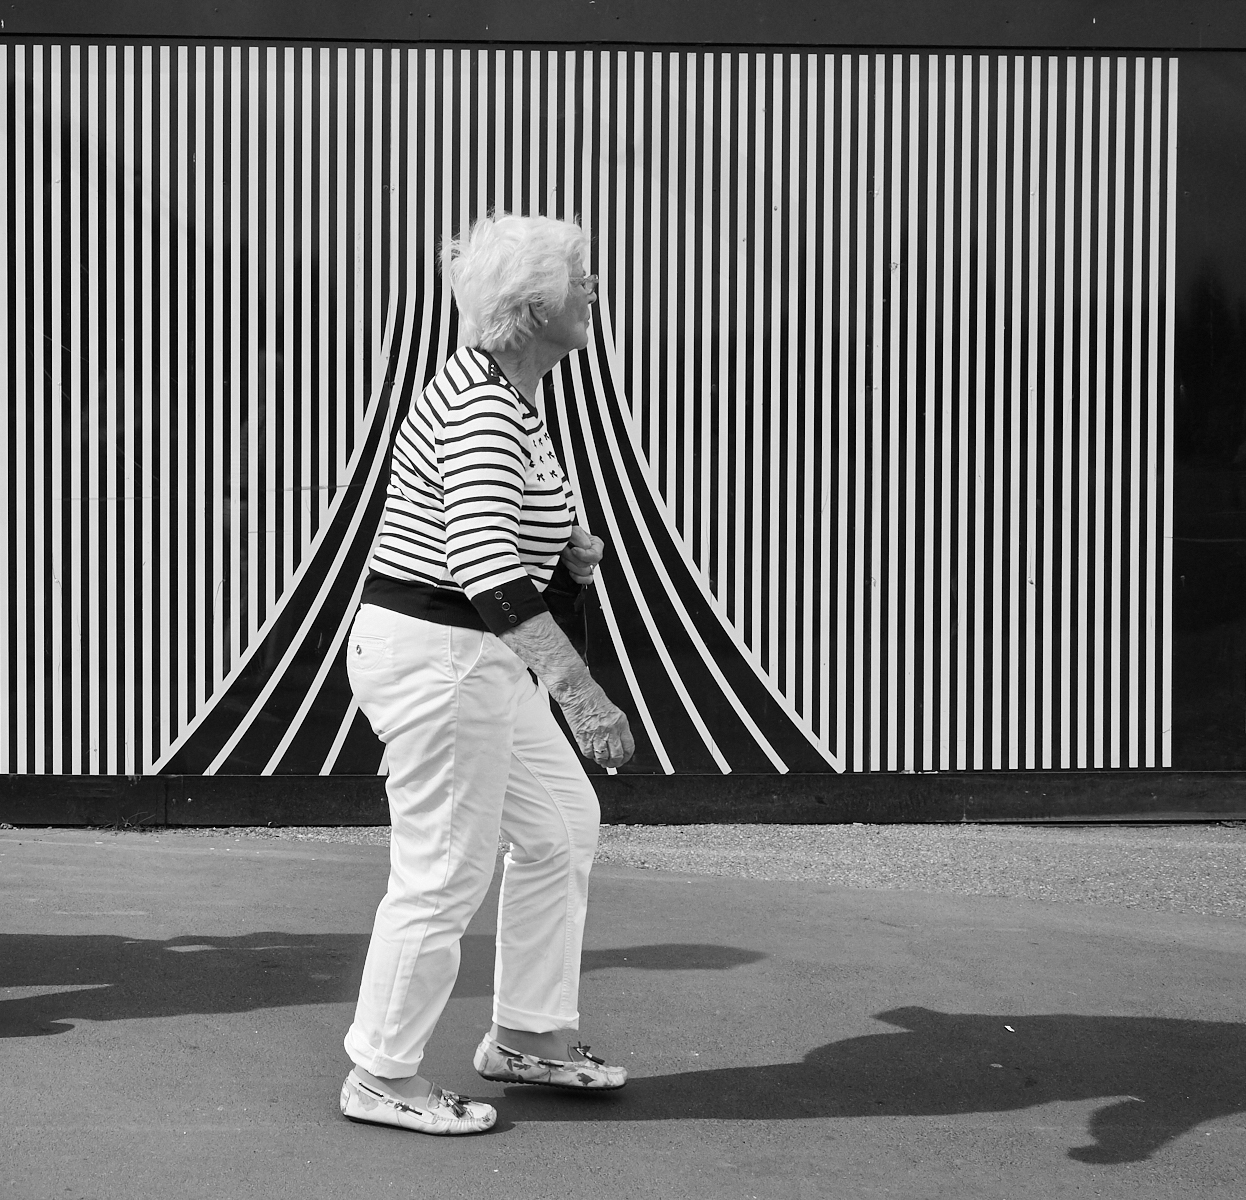 Striped1600x1200 sRGB 1.jpg